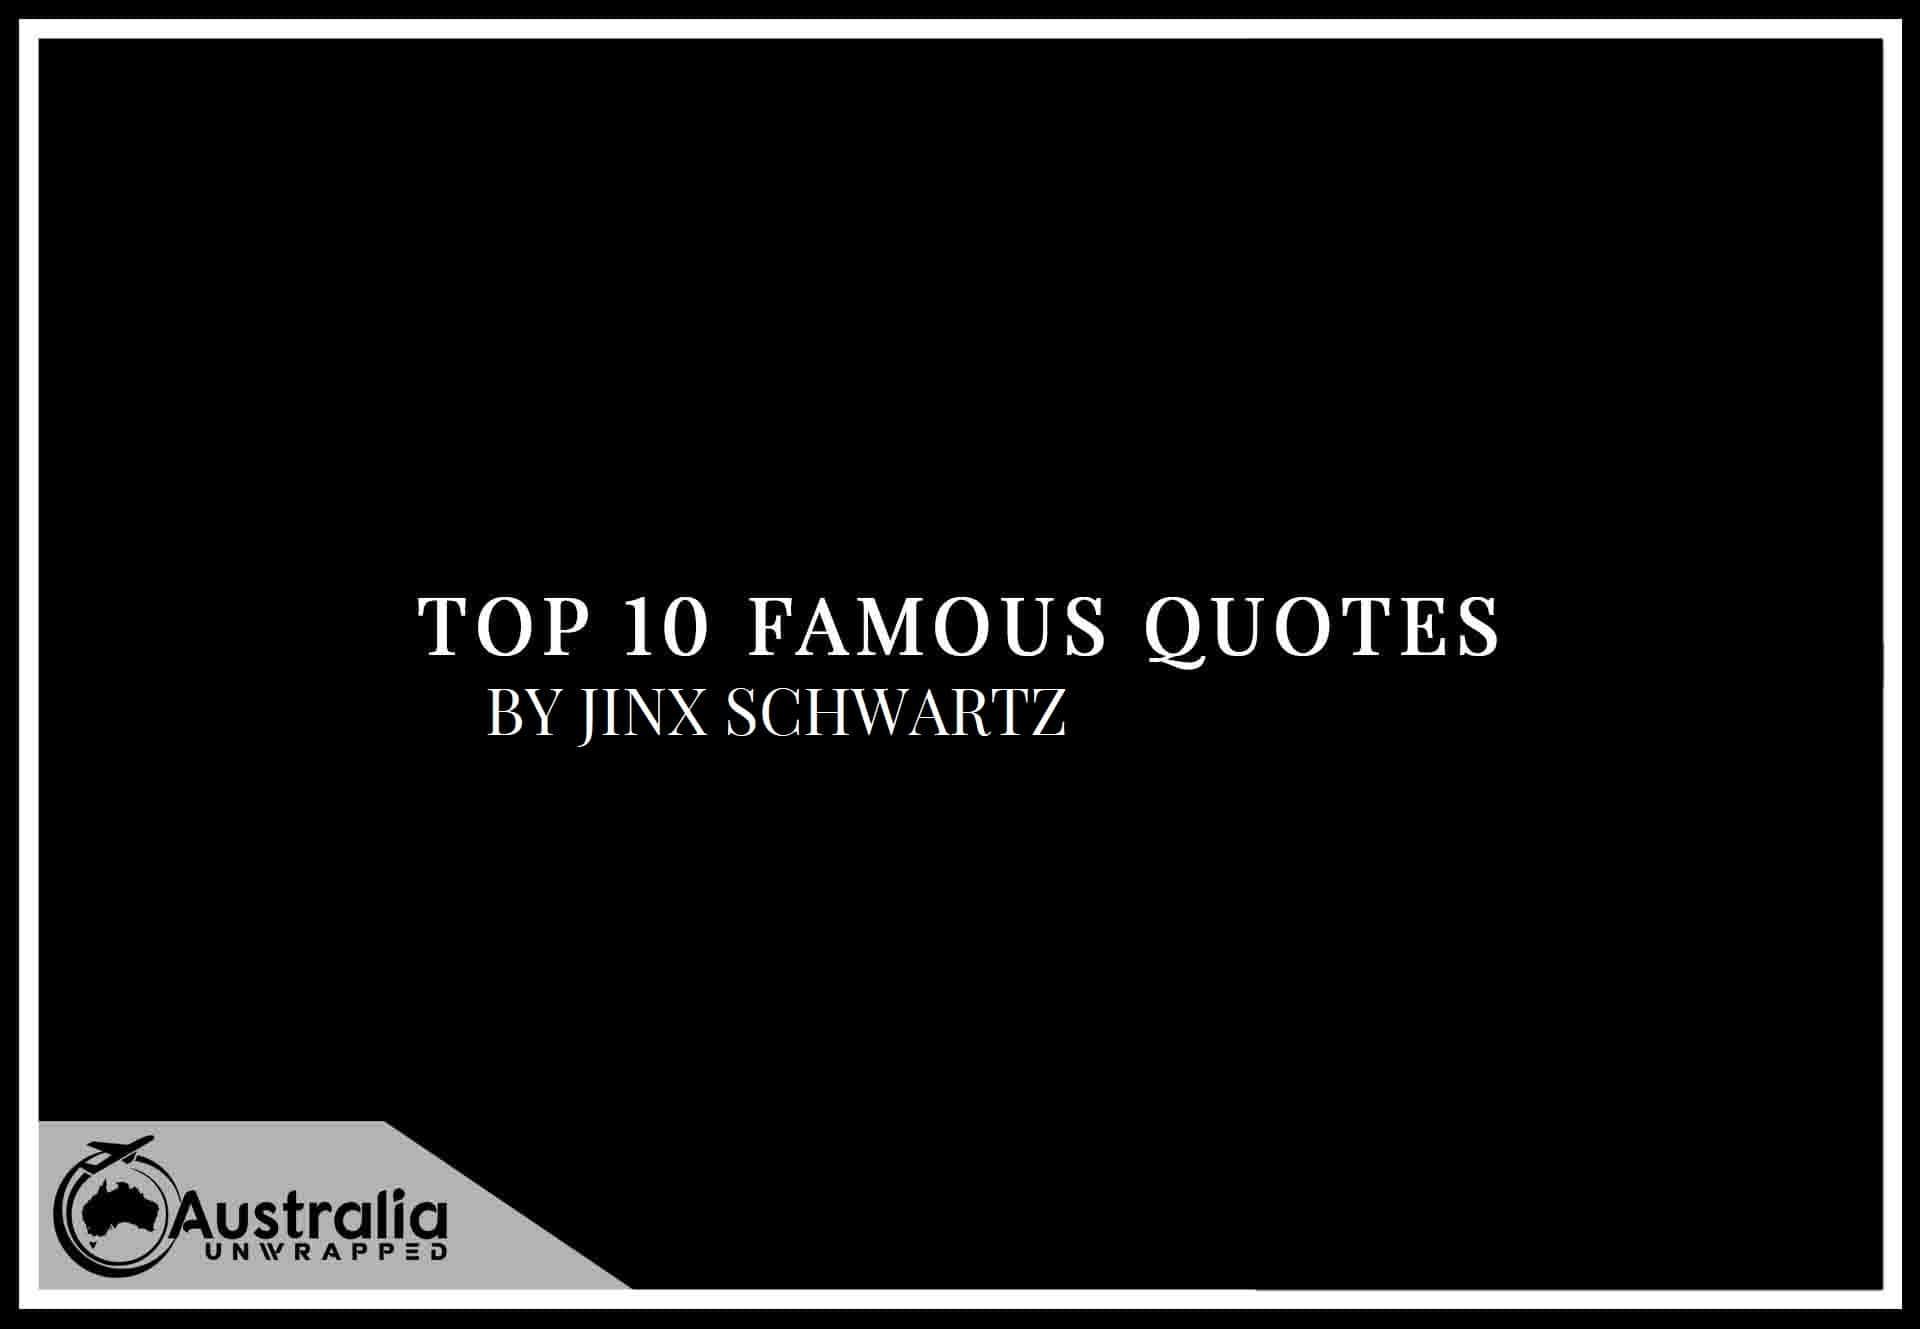 Top 10 Famous Quotes by Author Jinx Schwartz